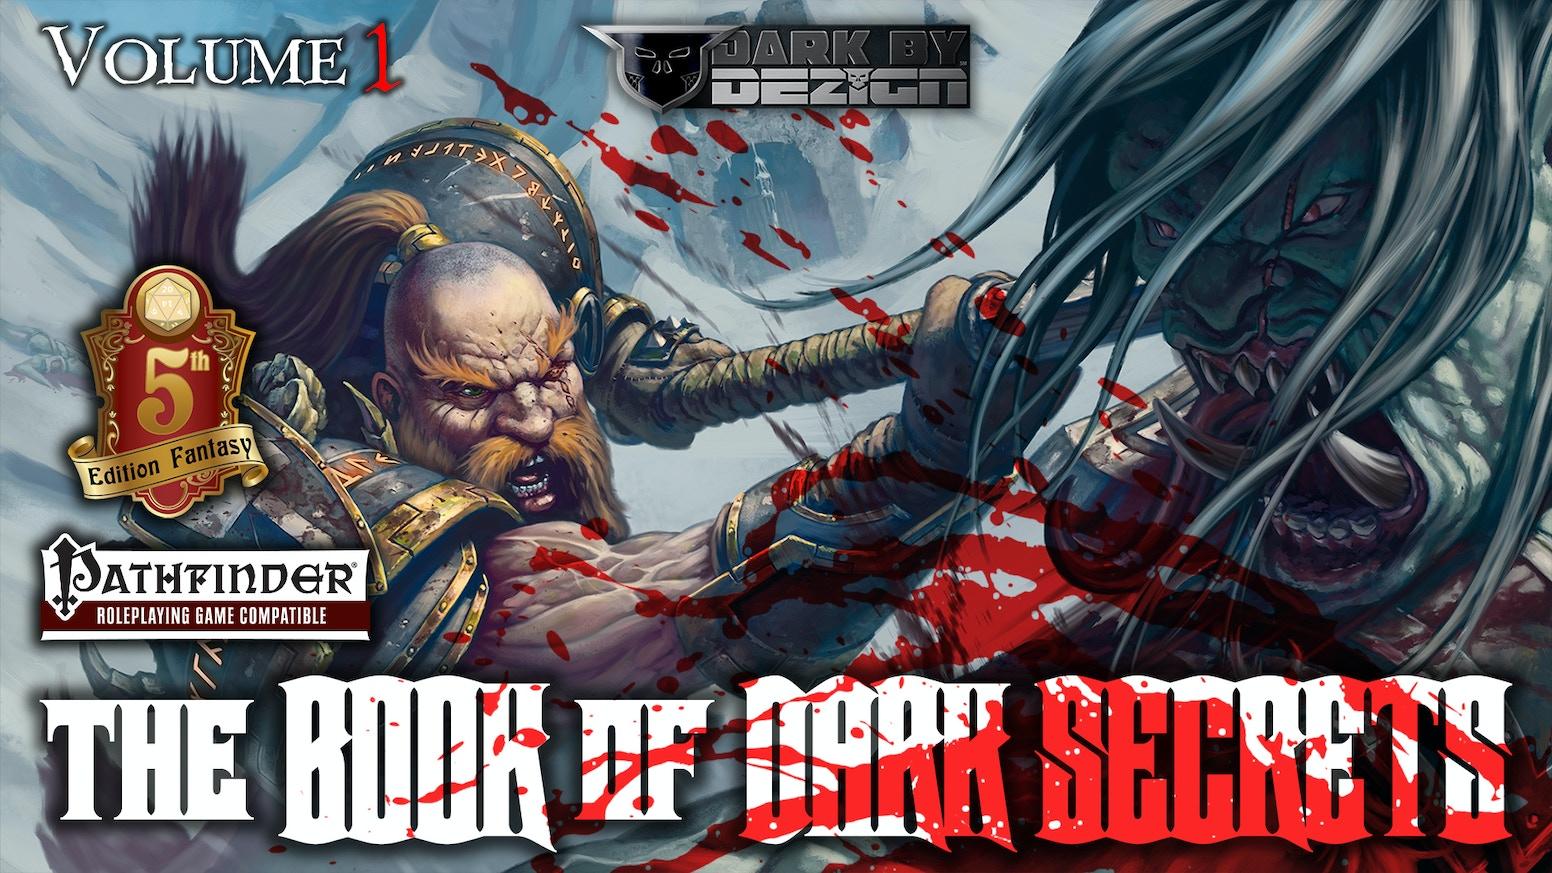 THE BOOK OF DARK SECRETS - D&D 5e Pathfinder Adventures by